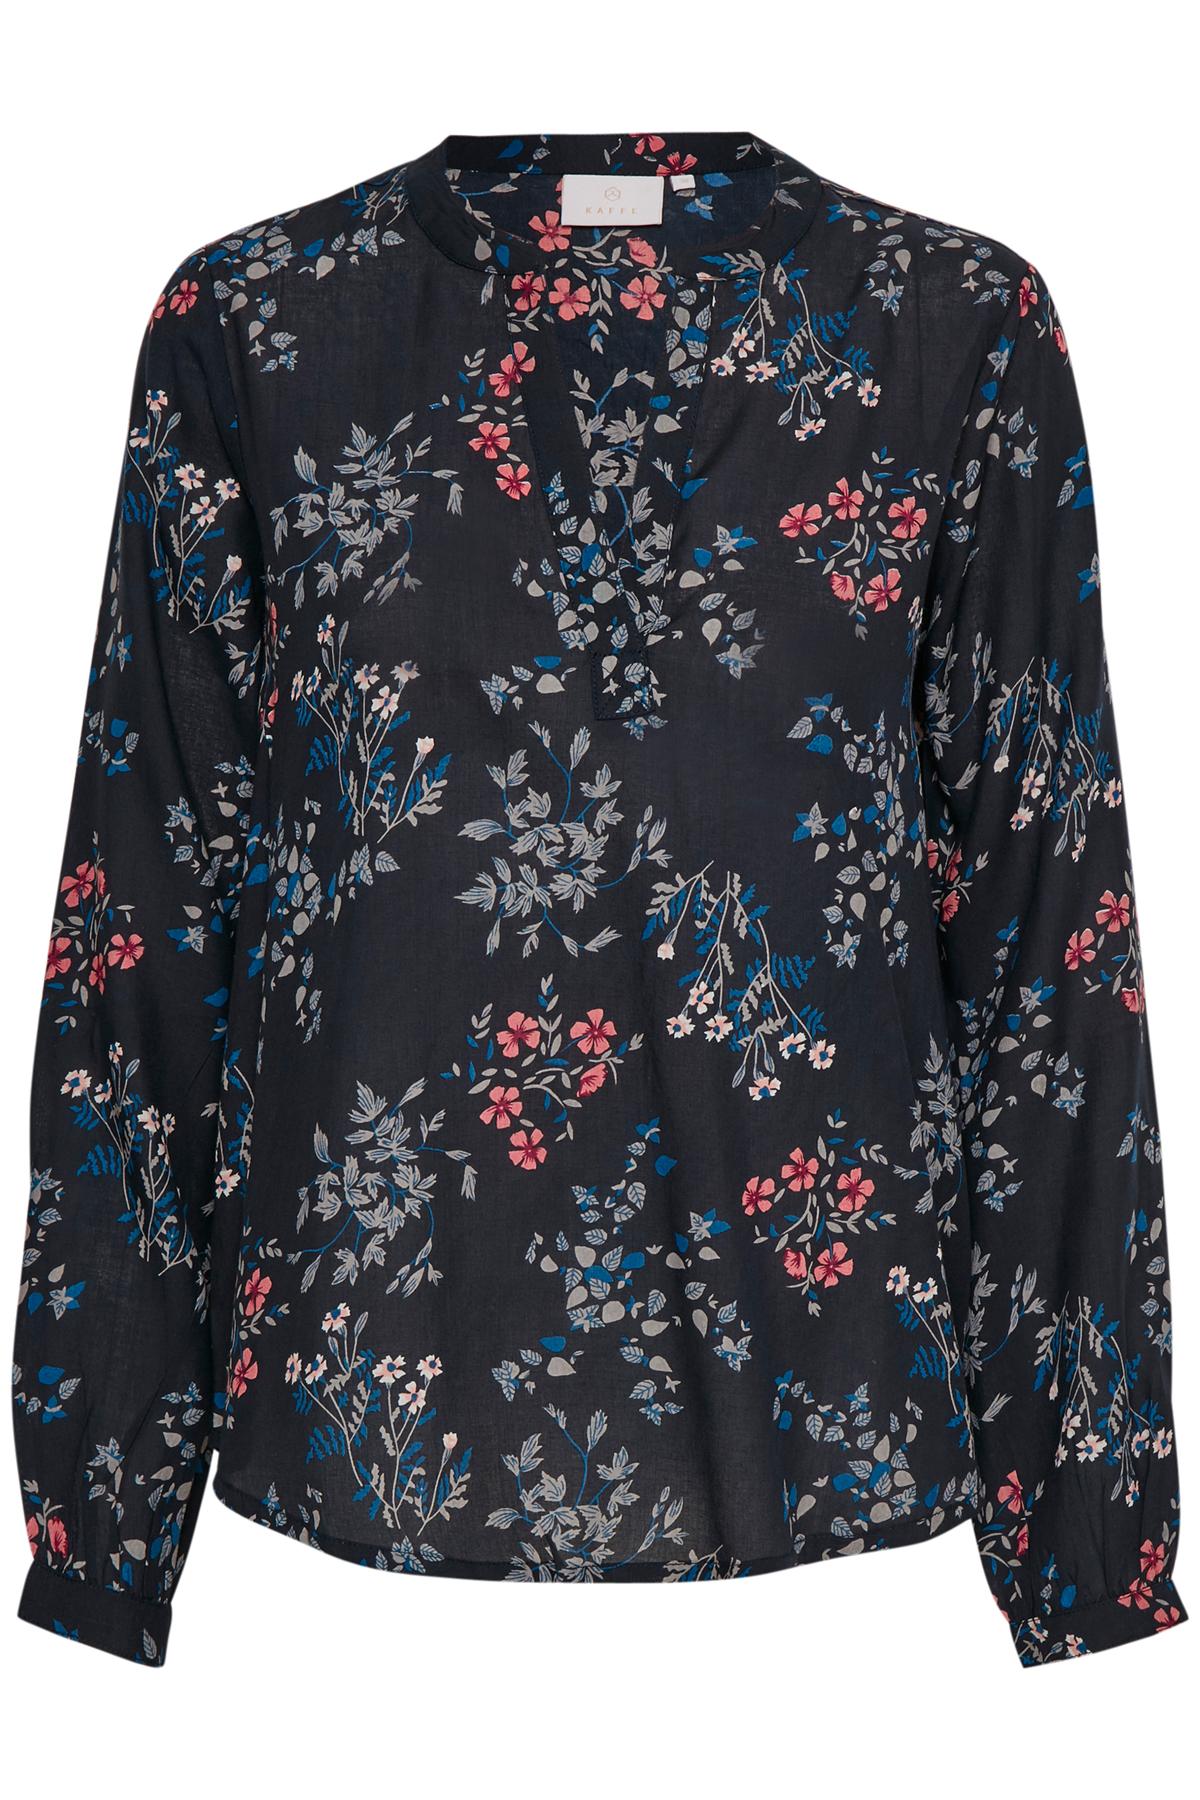 Marineblau Langarm-Bluse von Kaffe – Shoppen SieMarineblau Langarm-Bluse ab Gr. 34-46 hier